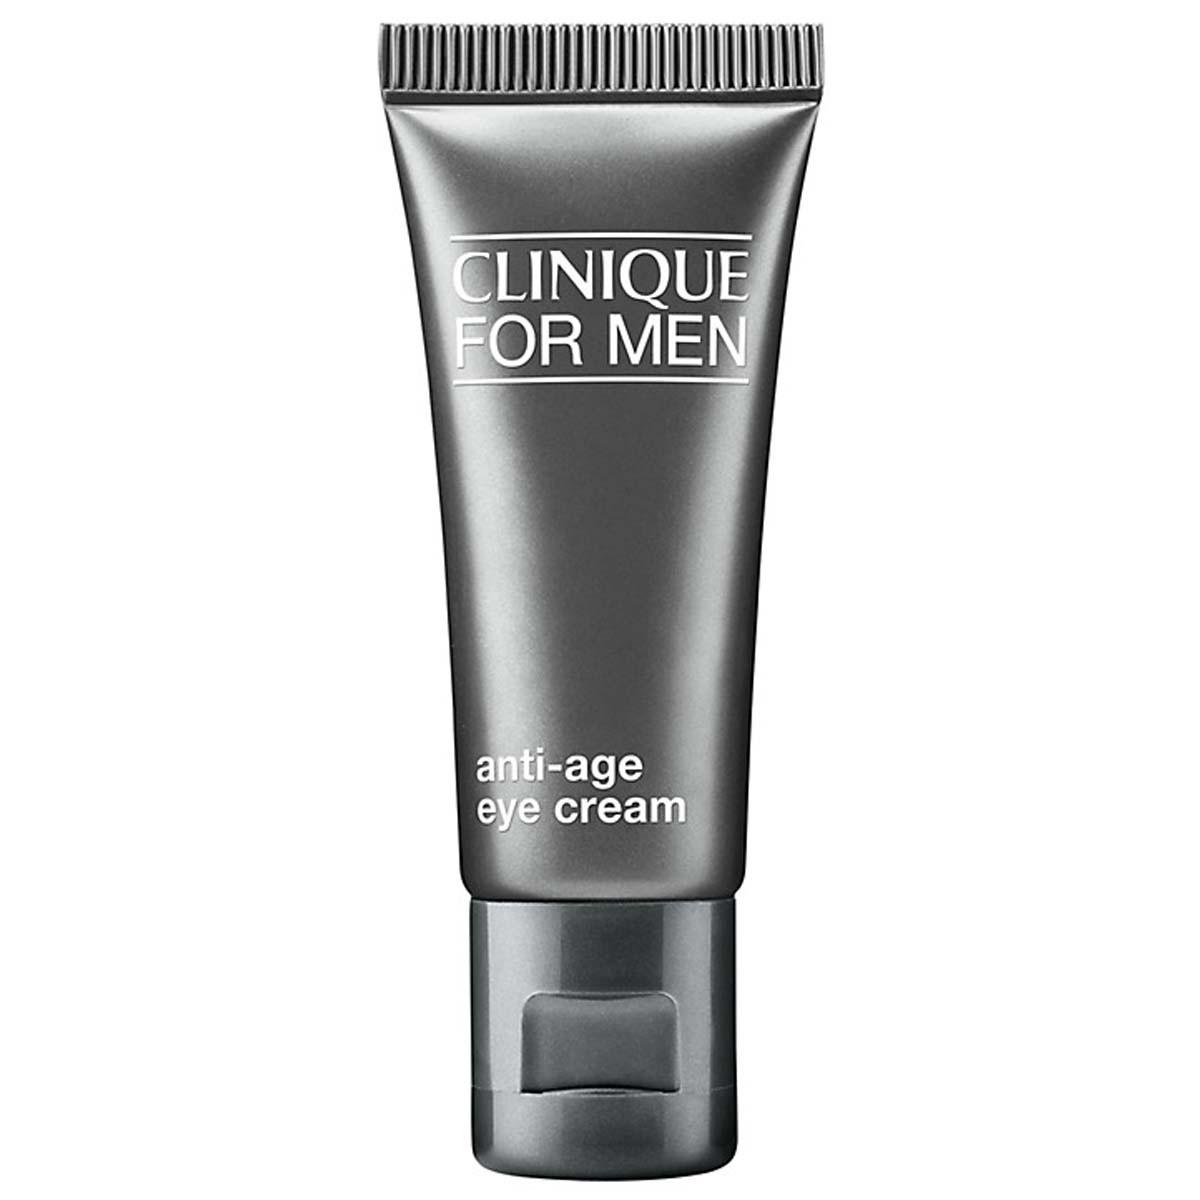 Clinique men anti-age eye cream 15 ml, Nero, large image number 0